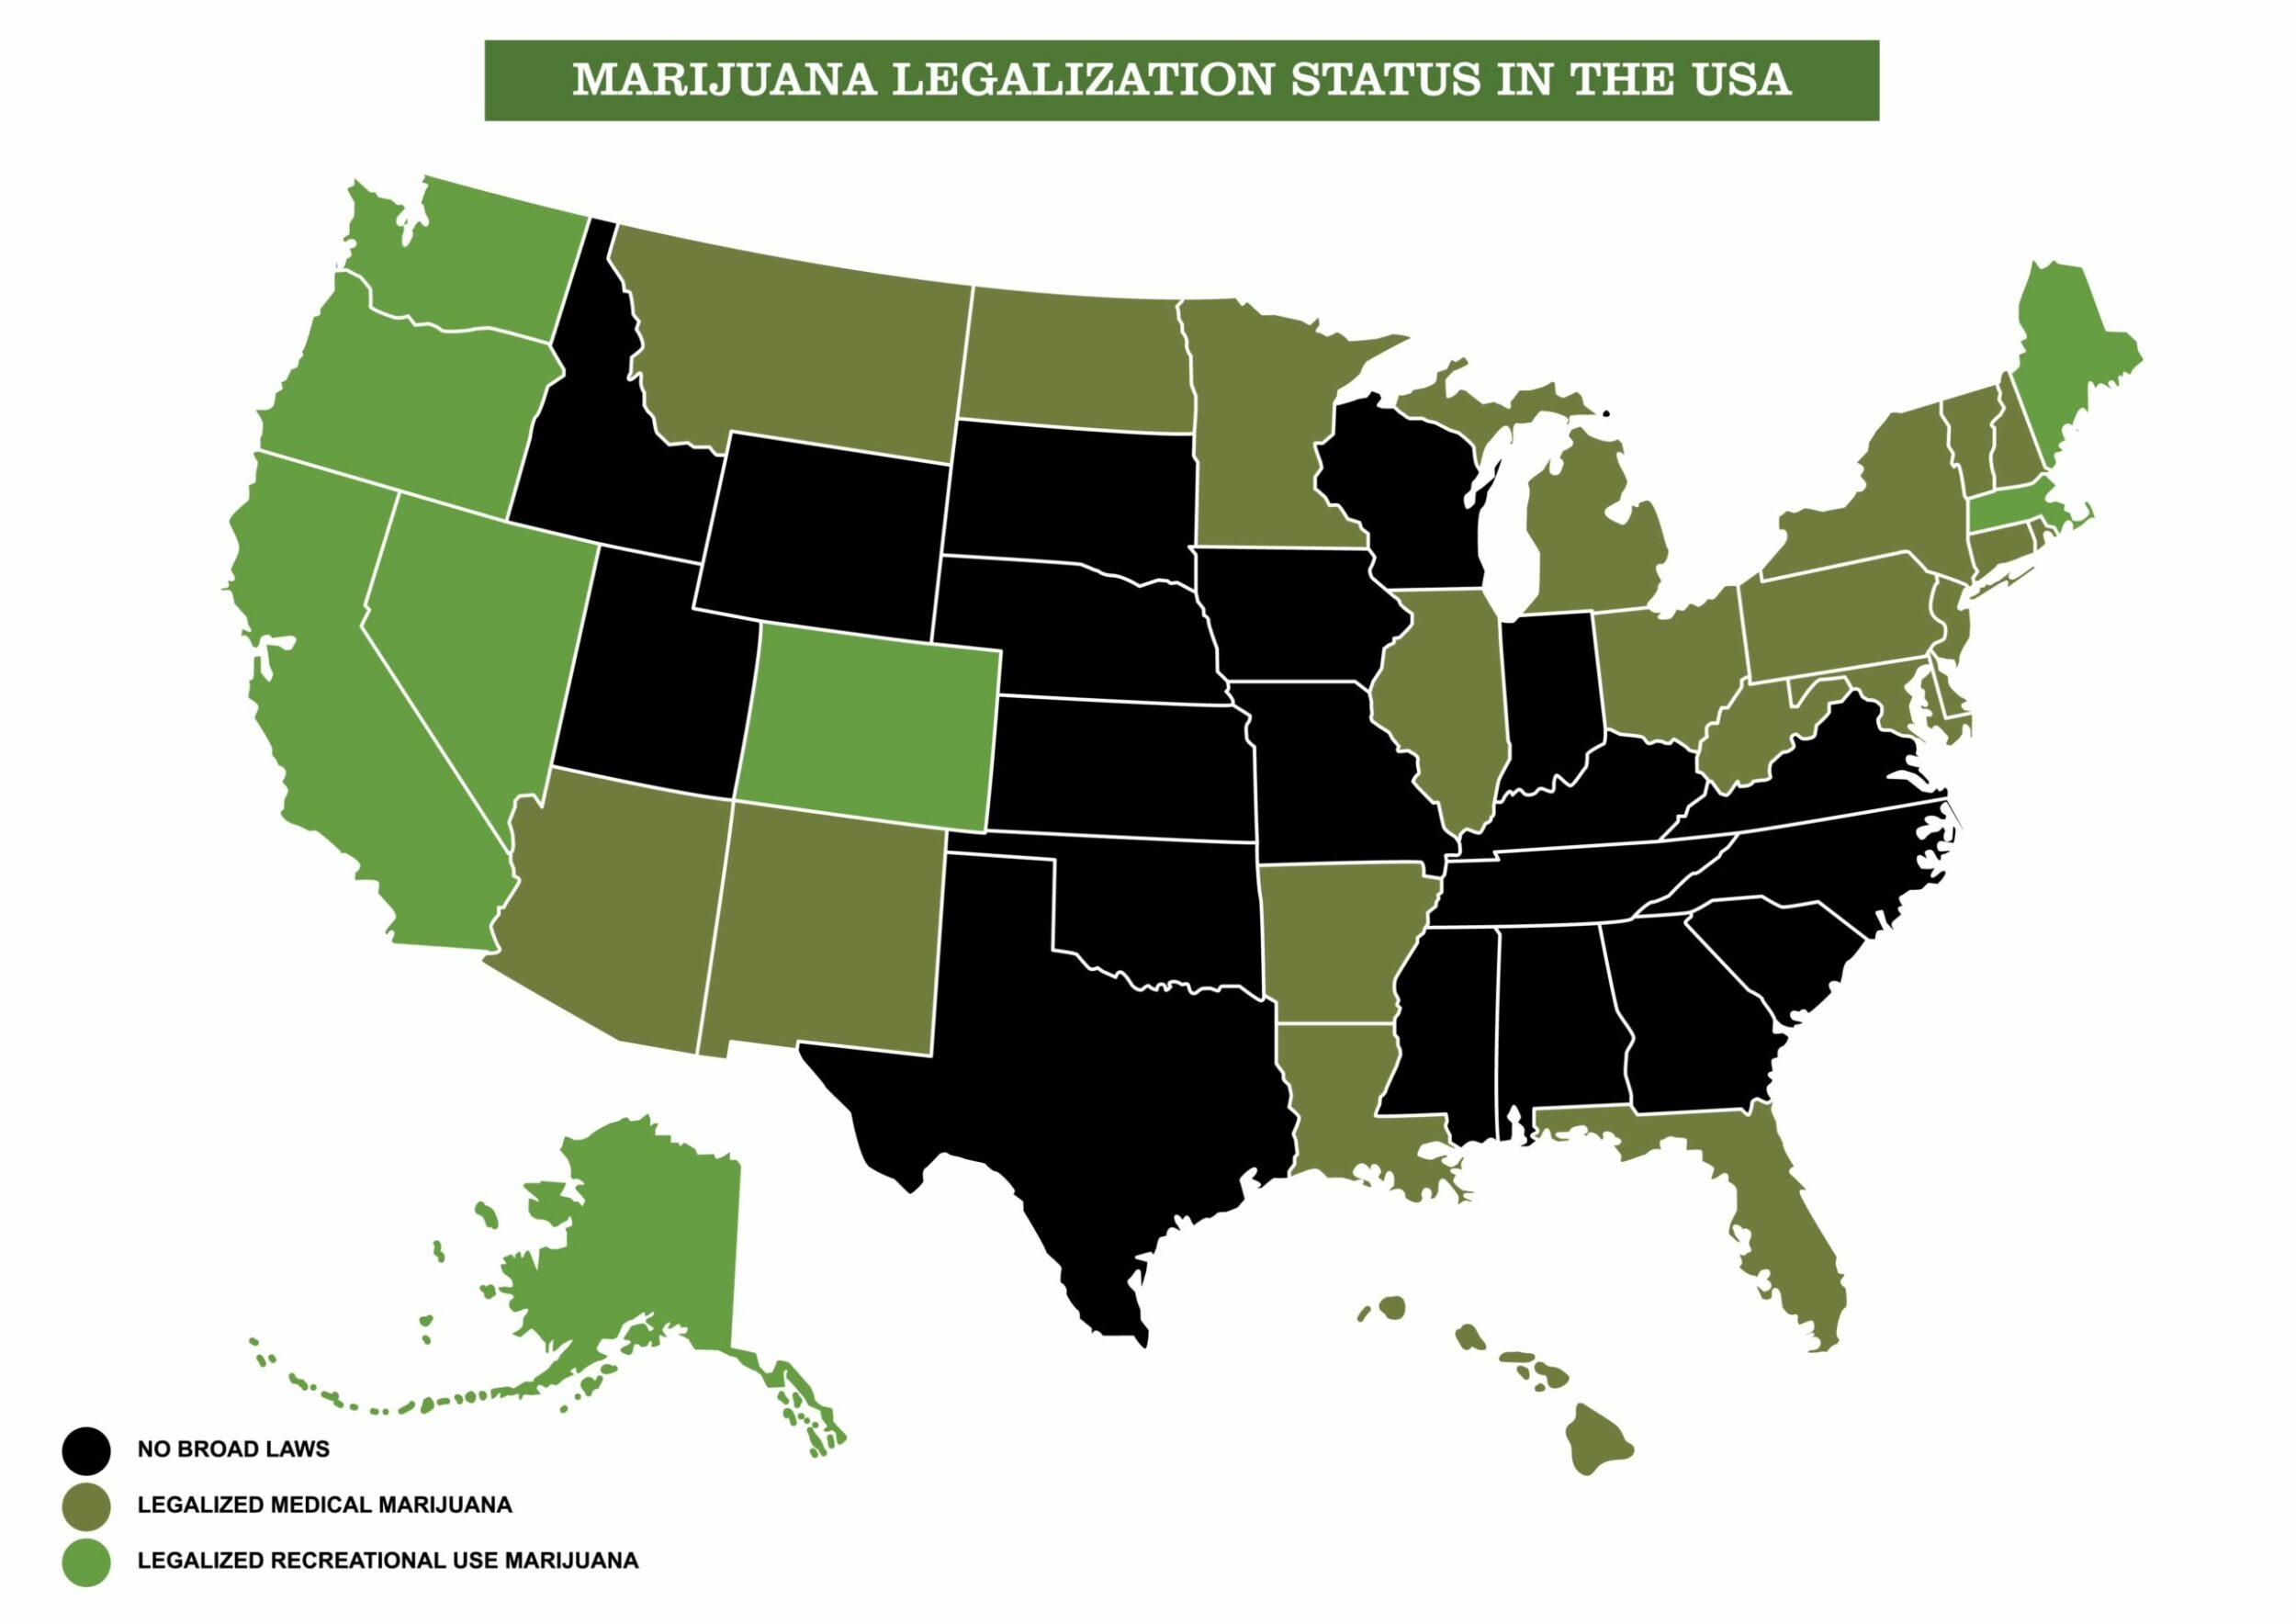 Marijuana legalization status in the USA photo